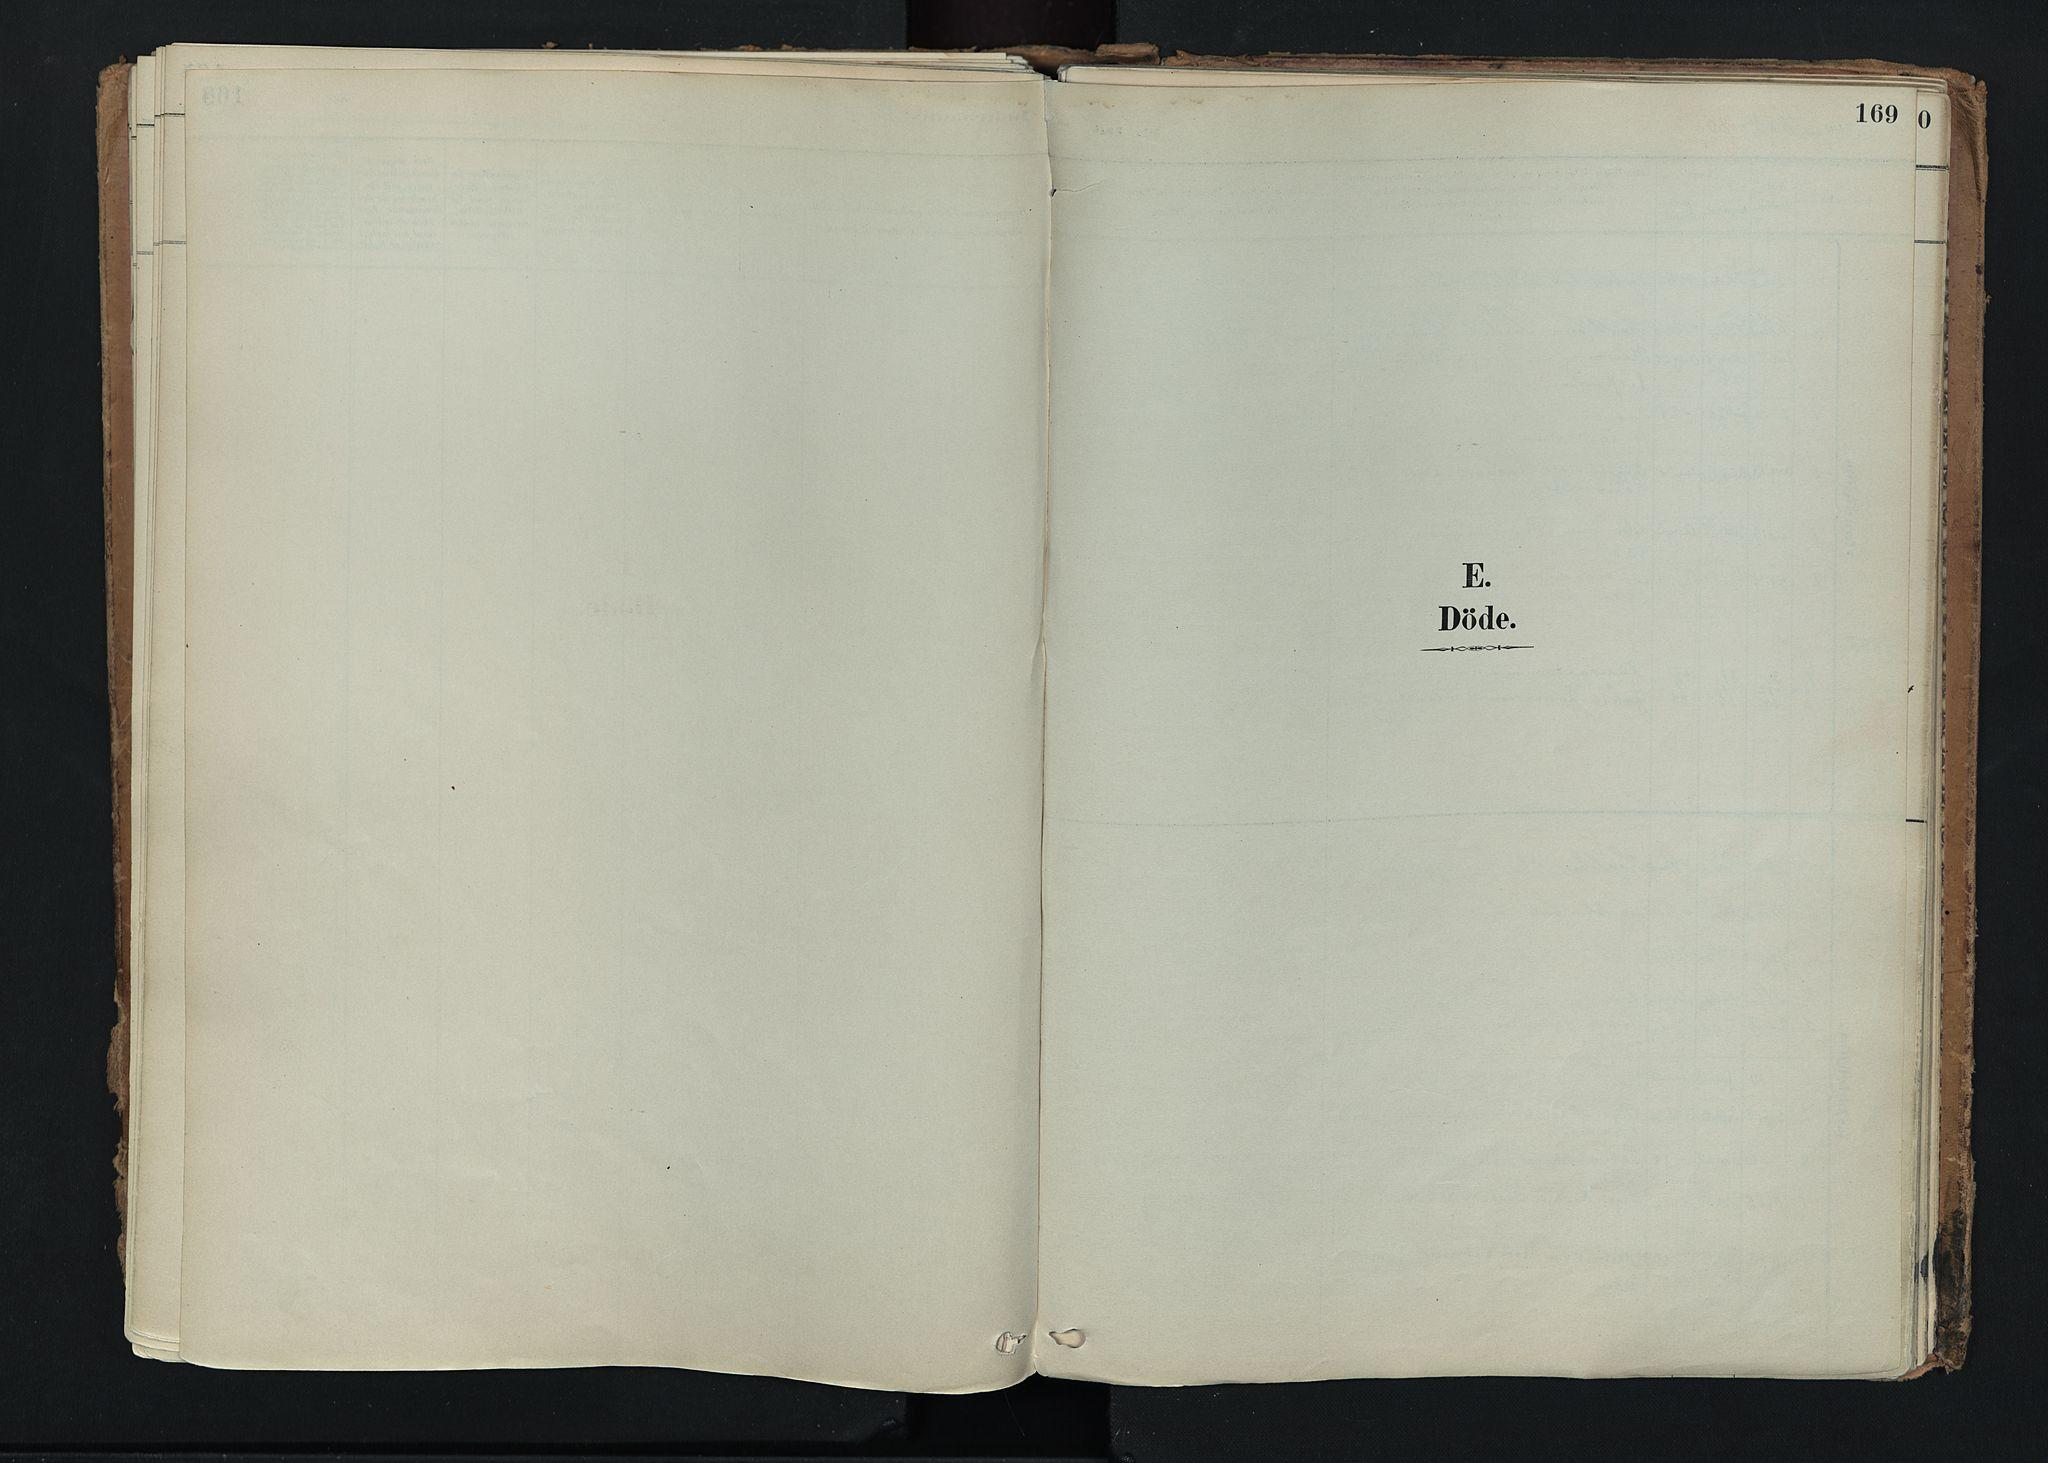 SAH, Nord-Fron prestekontor, Ministerialbok nr. 5, 1884-1914, s. 169